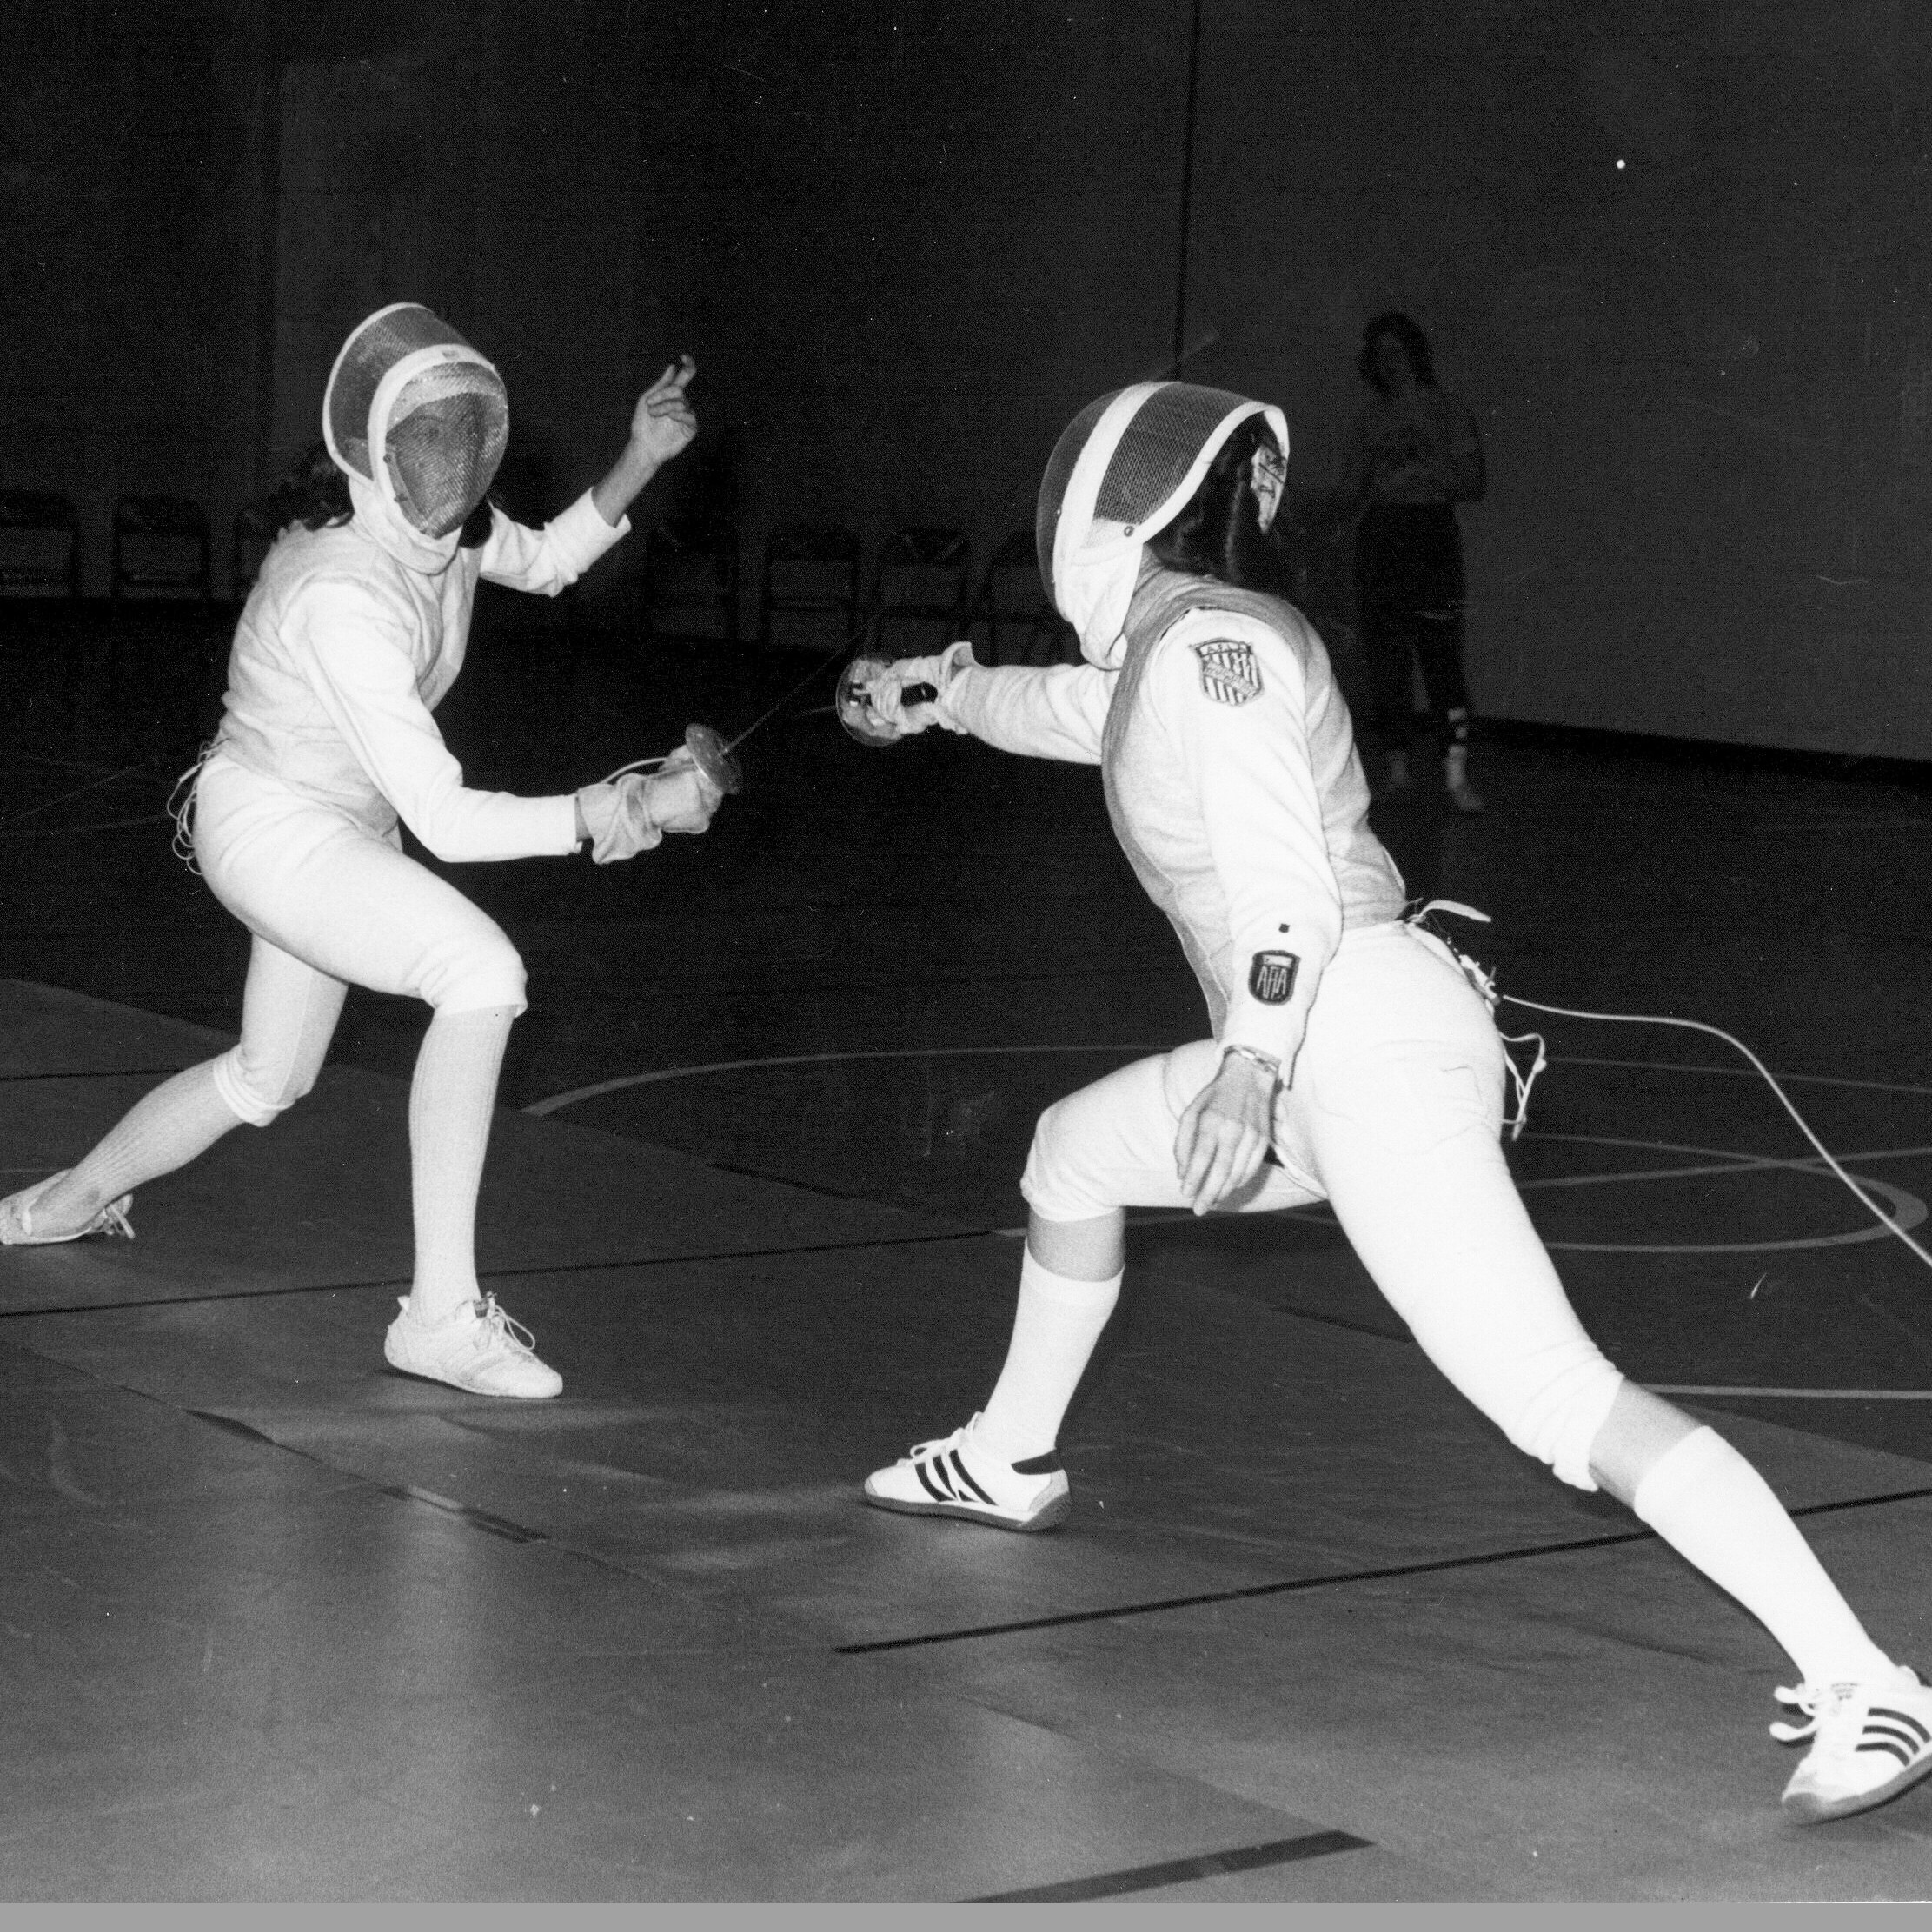 Men's Fencing at Clemson